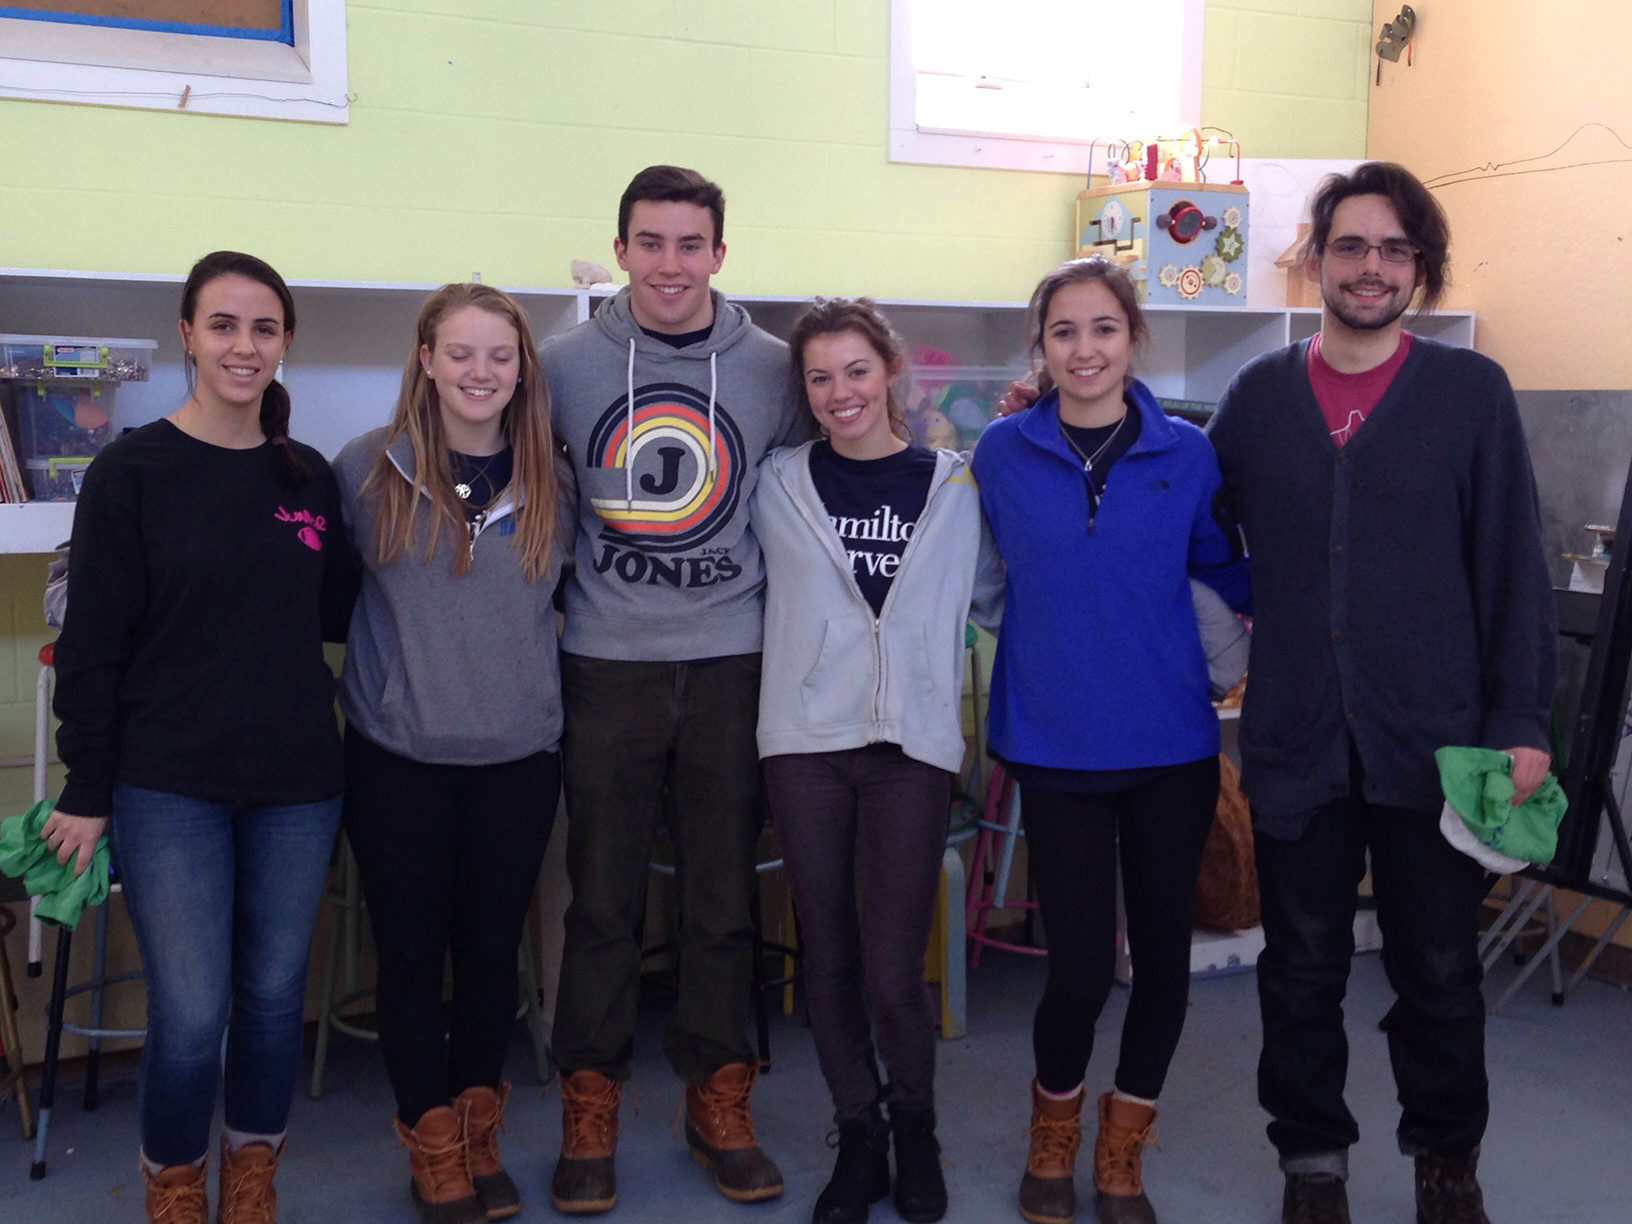 Group leader Hannah O'Leary '17, Allison Mogul '18, Jesse Heekin '18, Katherine Bauer '18, Caitlin Becker '18, and leader Kyle Burnhan'15 at the Kirkland Arts Center.